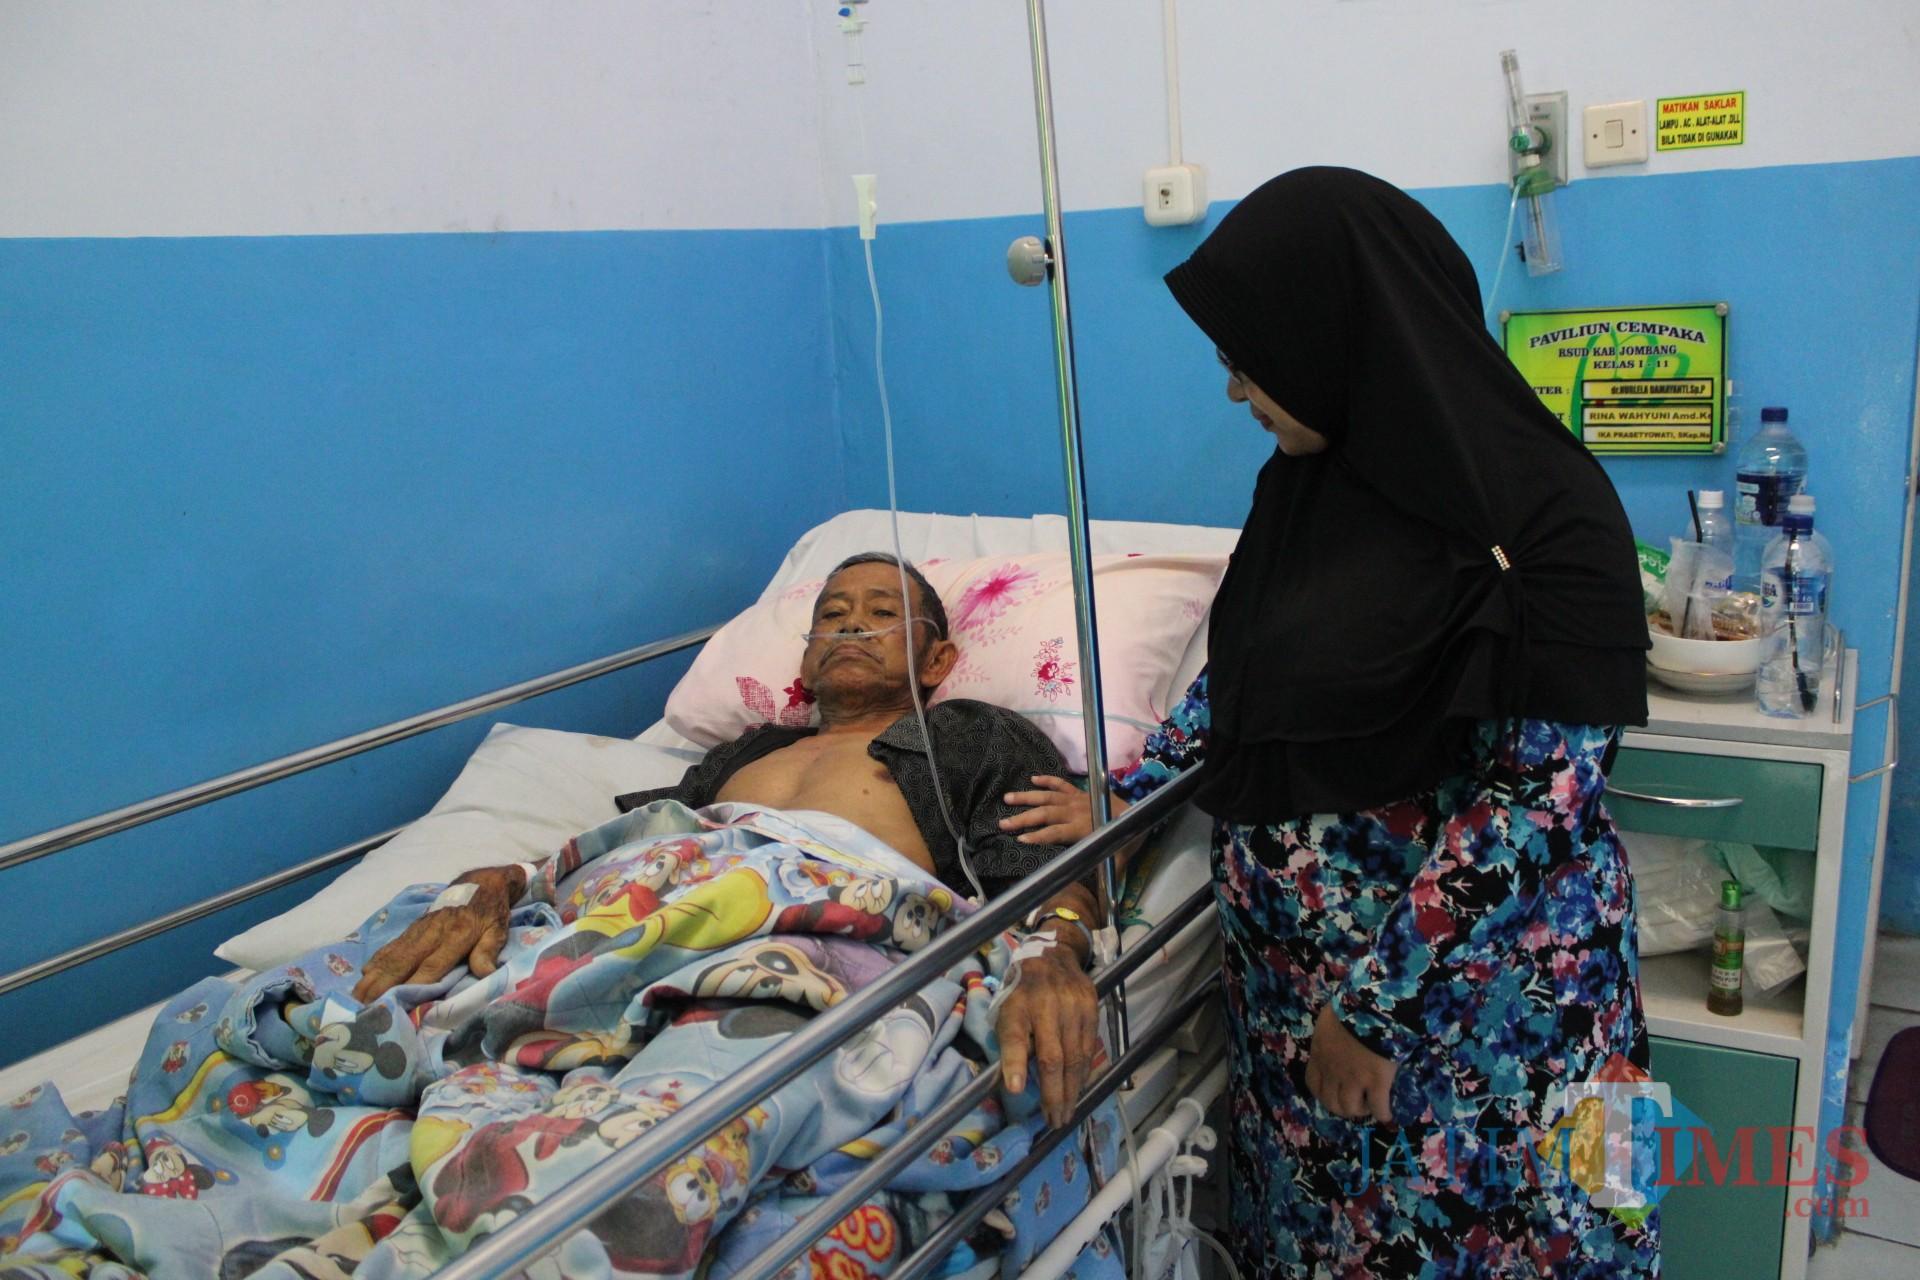 Dirawat Di Rumah Sakit Dua Cjh Jombang Gagal Naik Haji Jatim Times